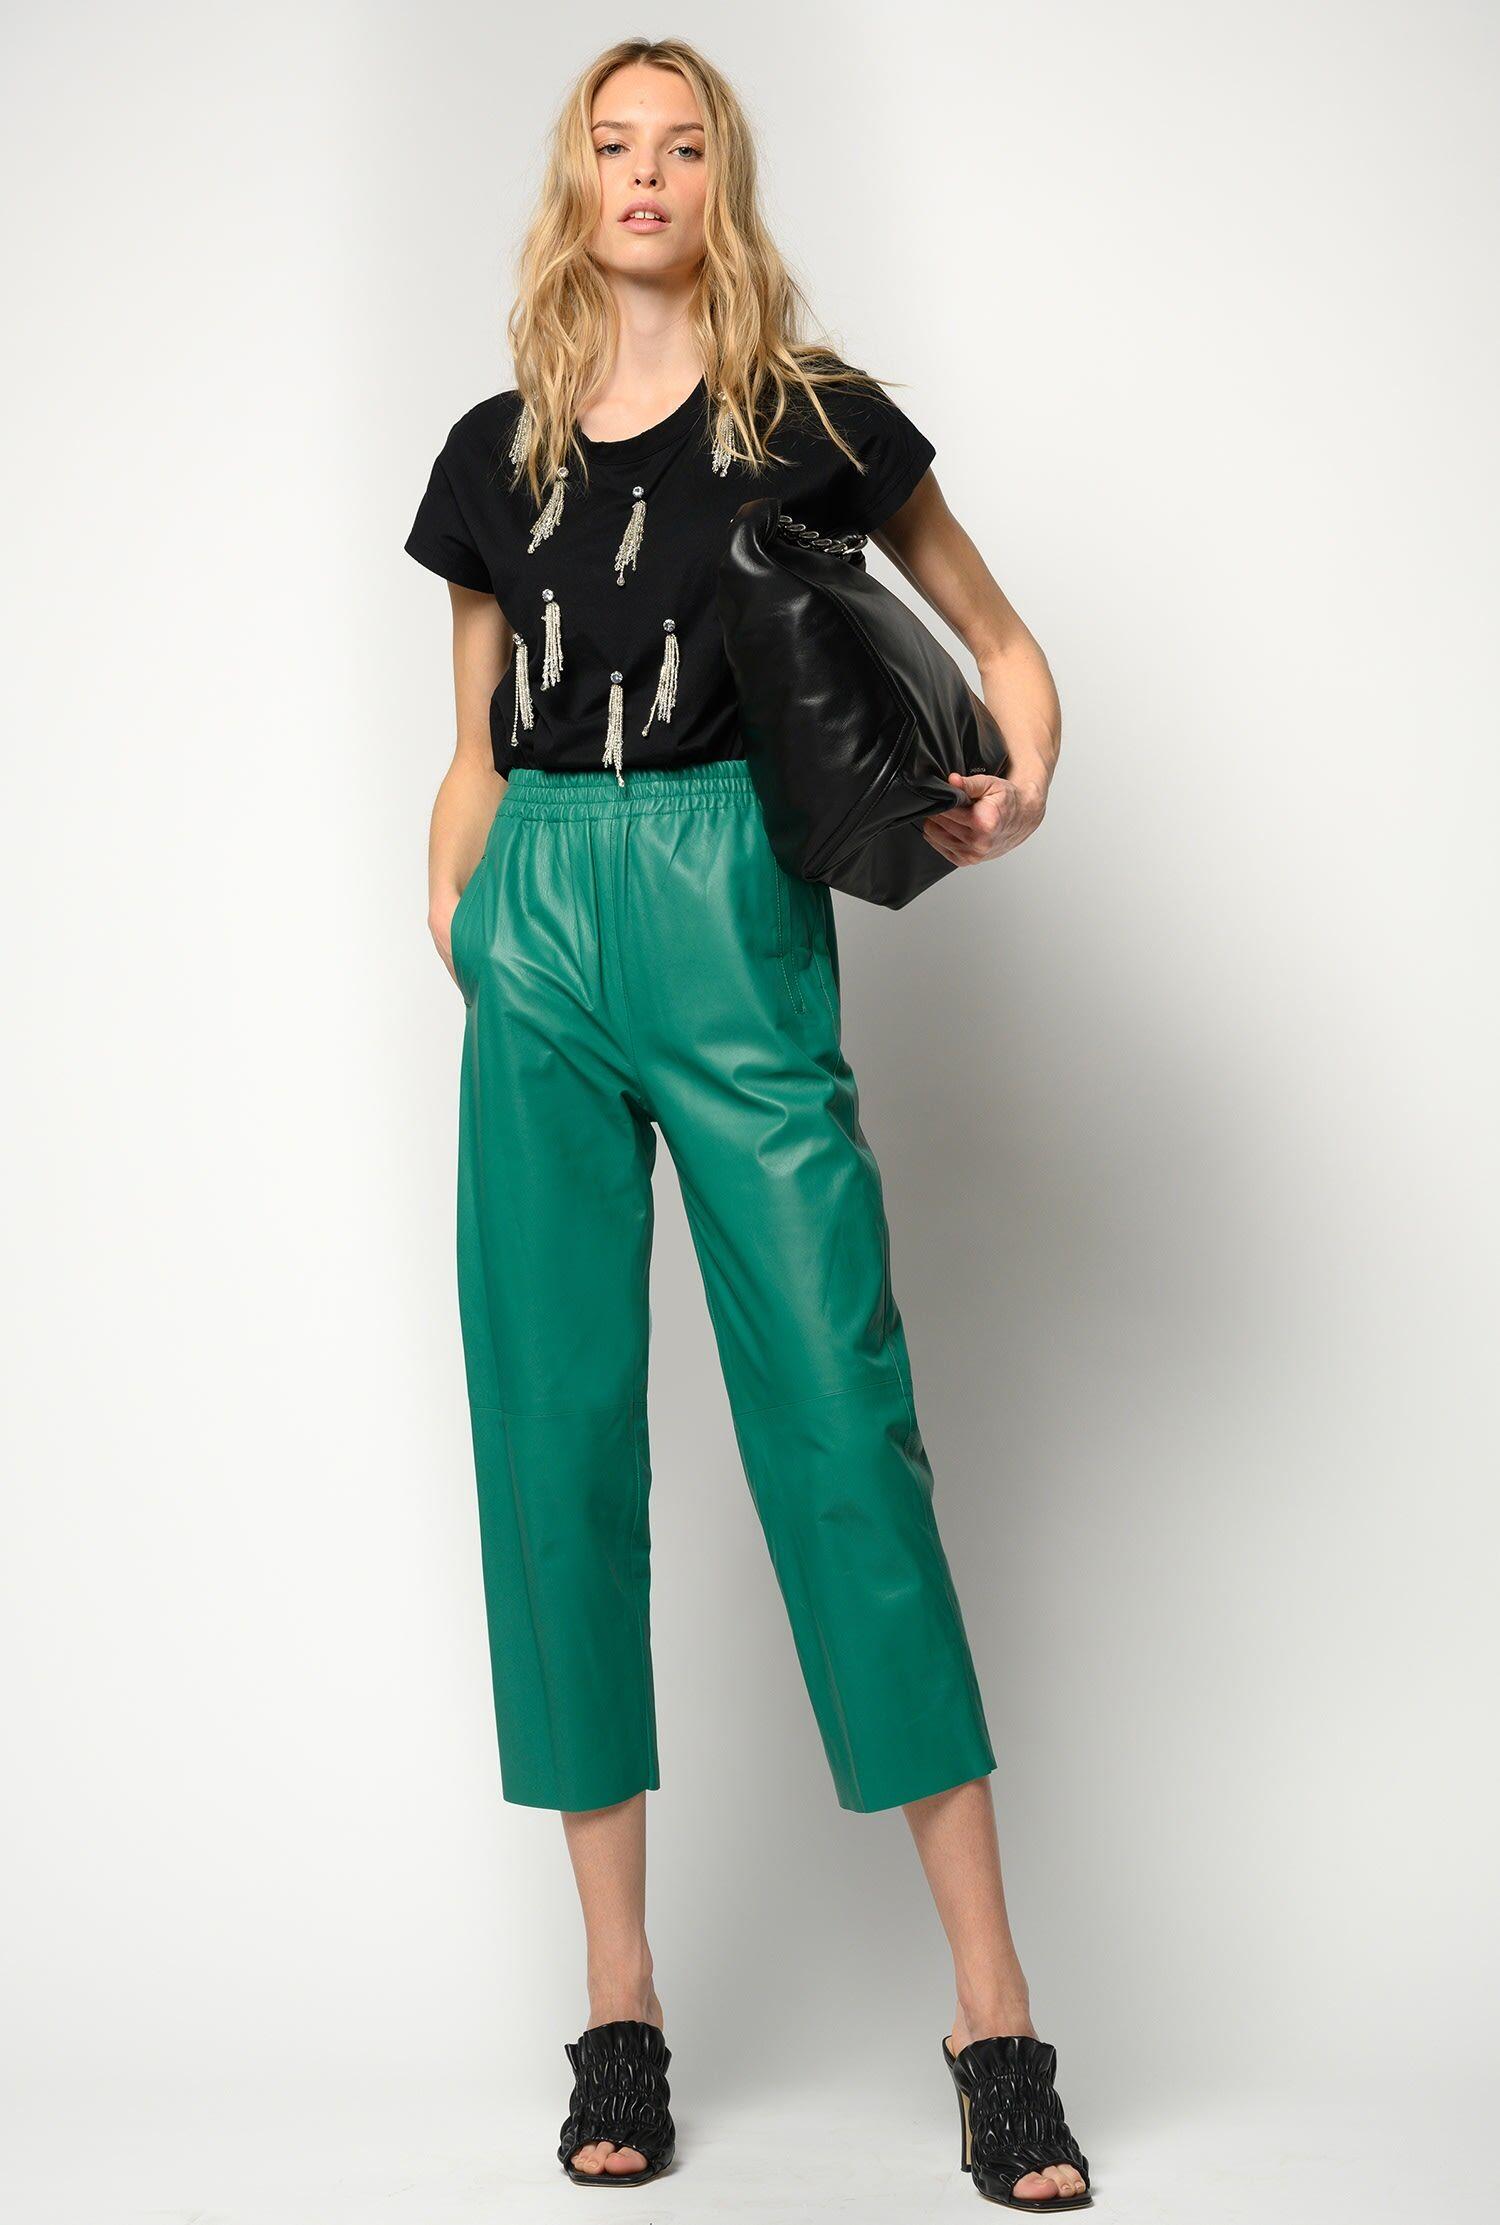 Ultralight Leather Pants - Pinko